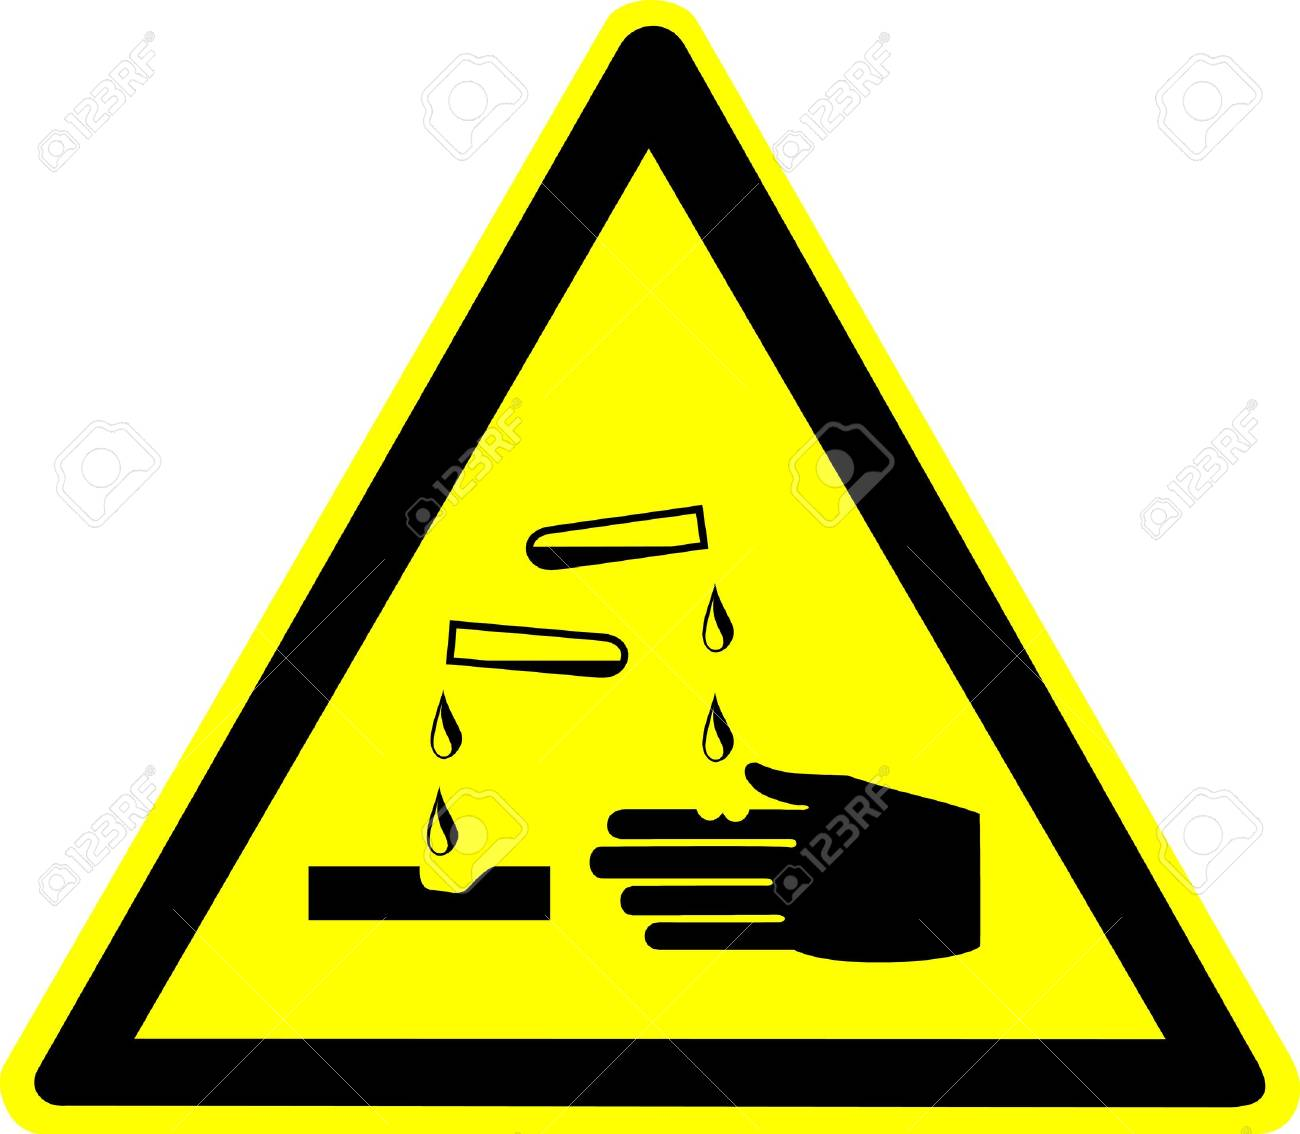 warning sign Stock Photo - 10645699